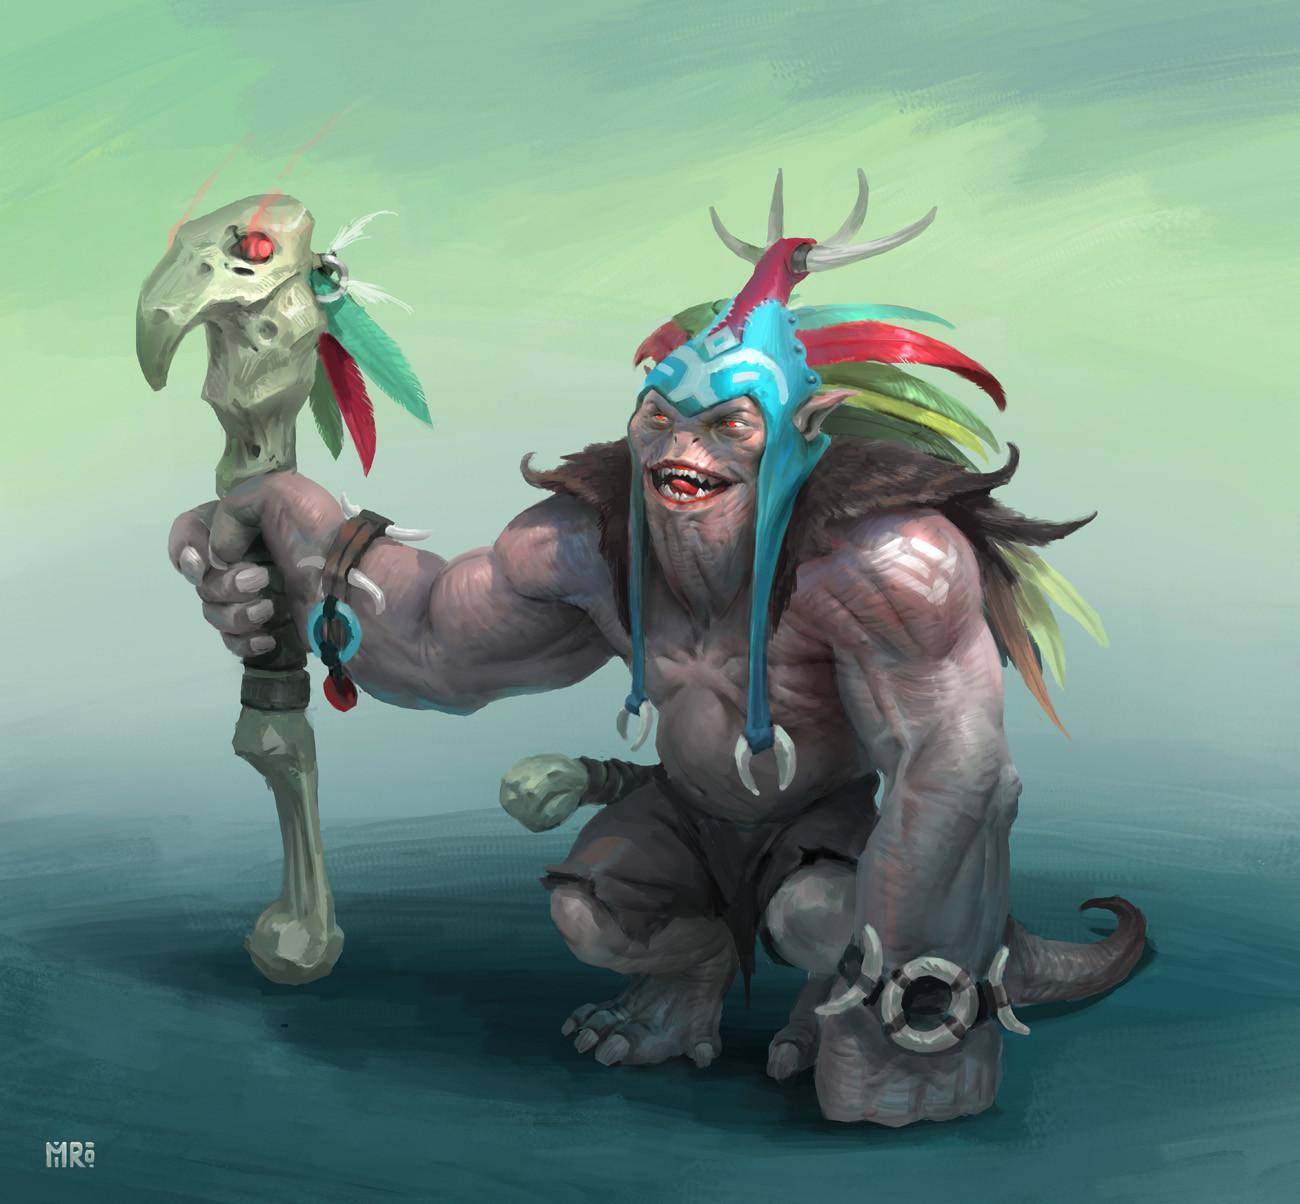 The shaman dude